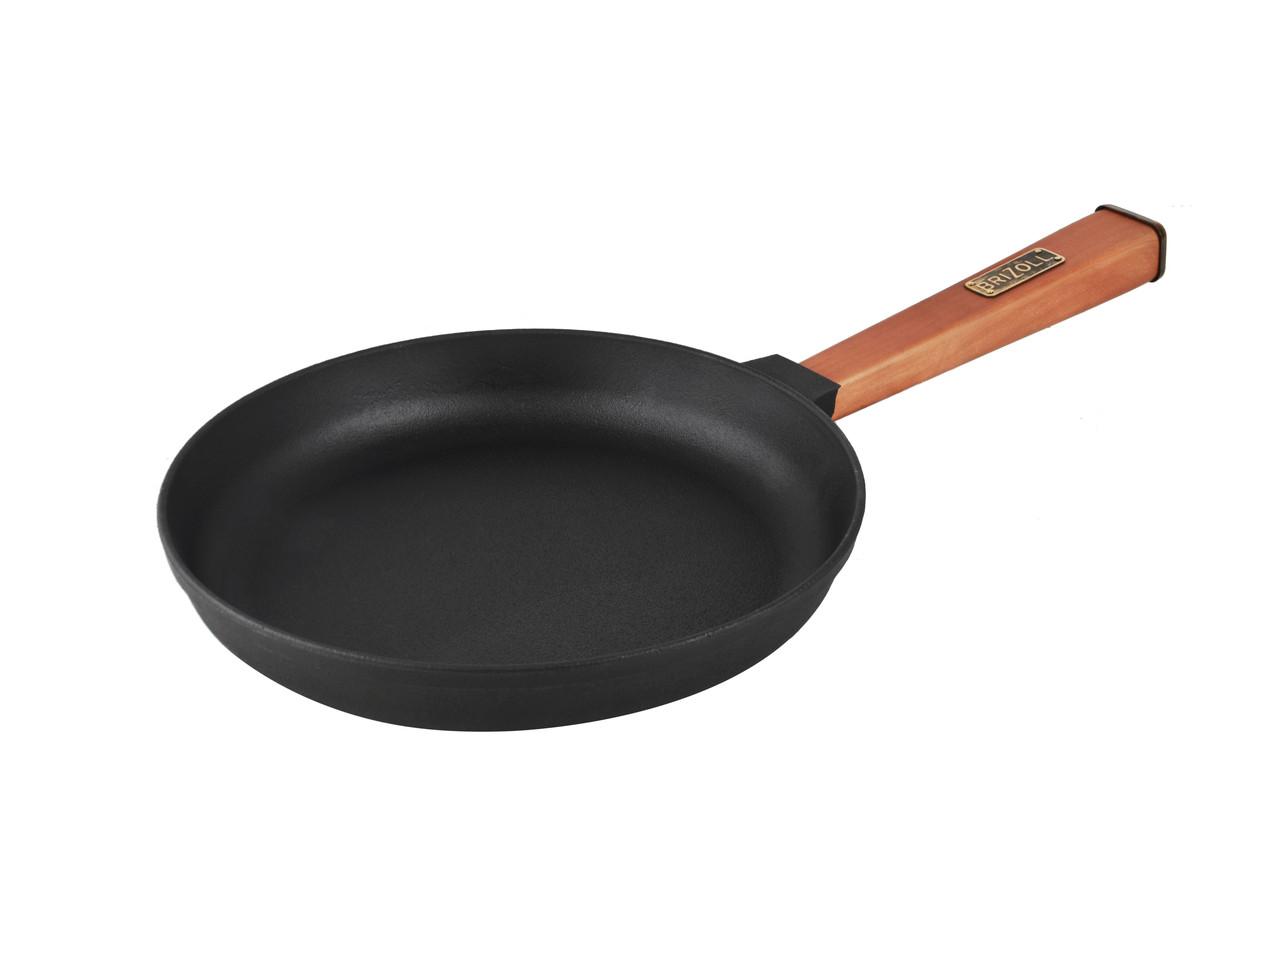 Сковорода с ручкой чугун Optima 240 x 42 мм О2440-Р ТМ Brizoll